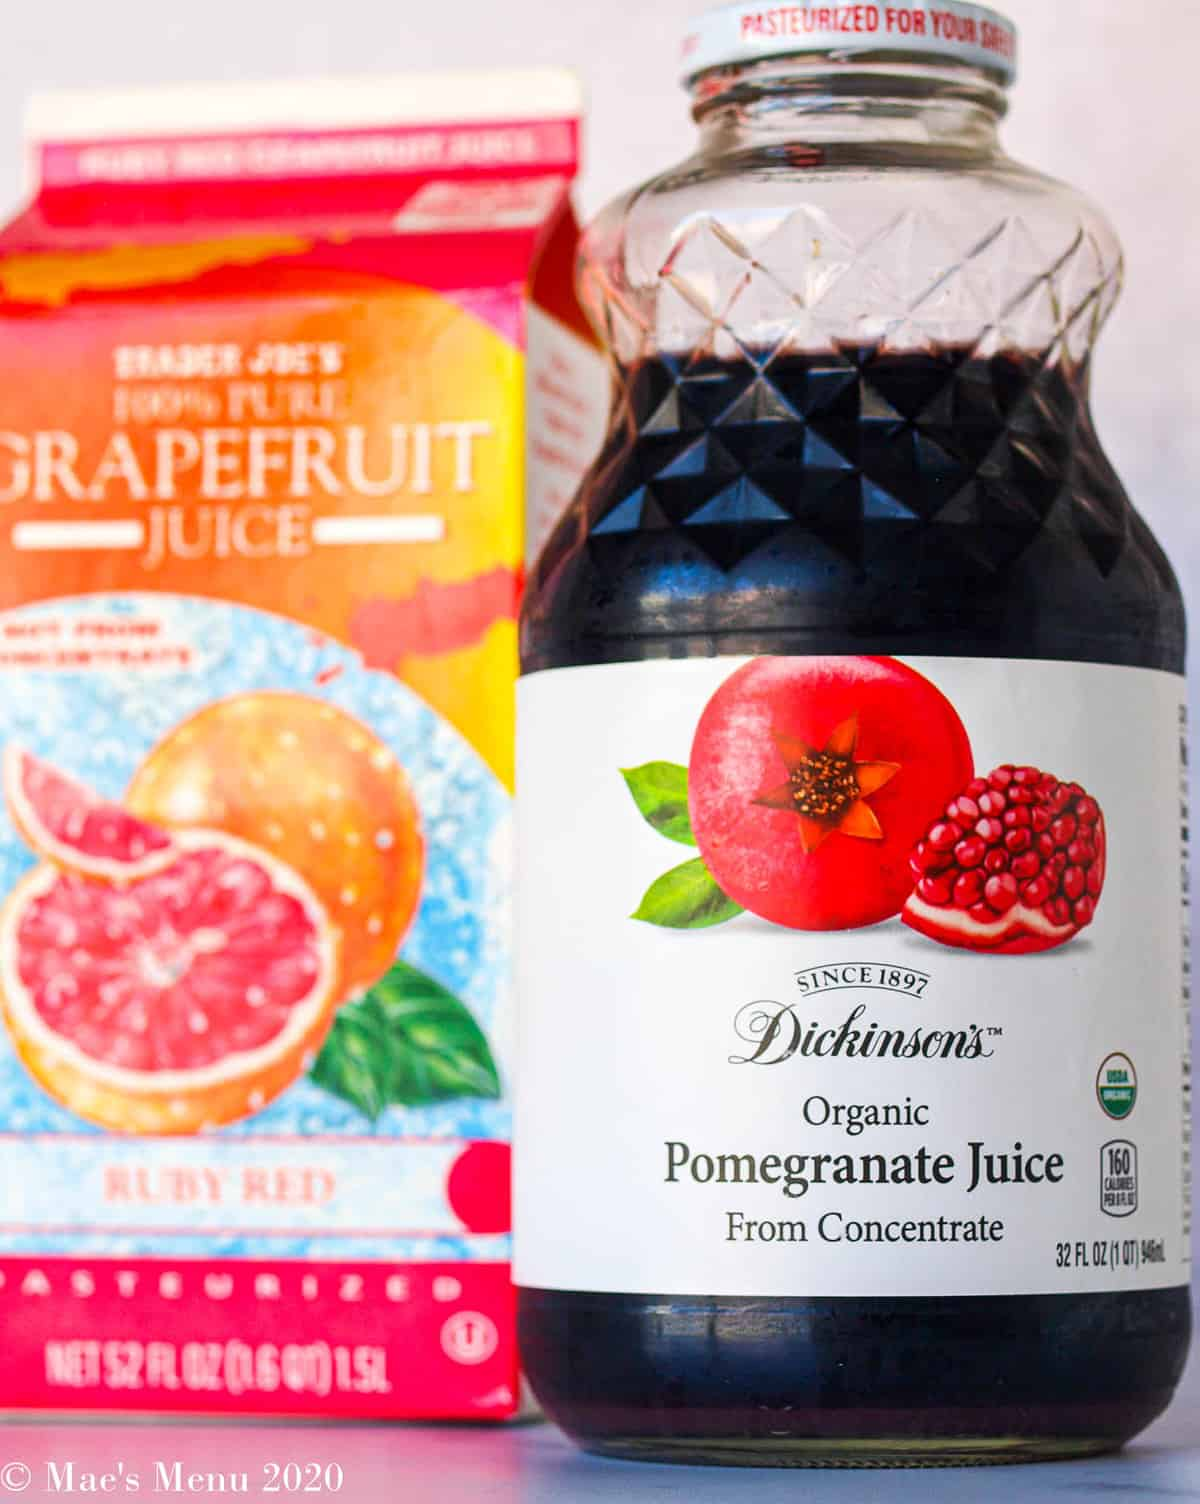 an up-close shot of a bottle of pomegranate juice and a carton of grapefruit juice